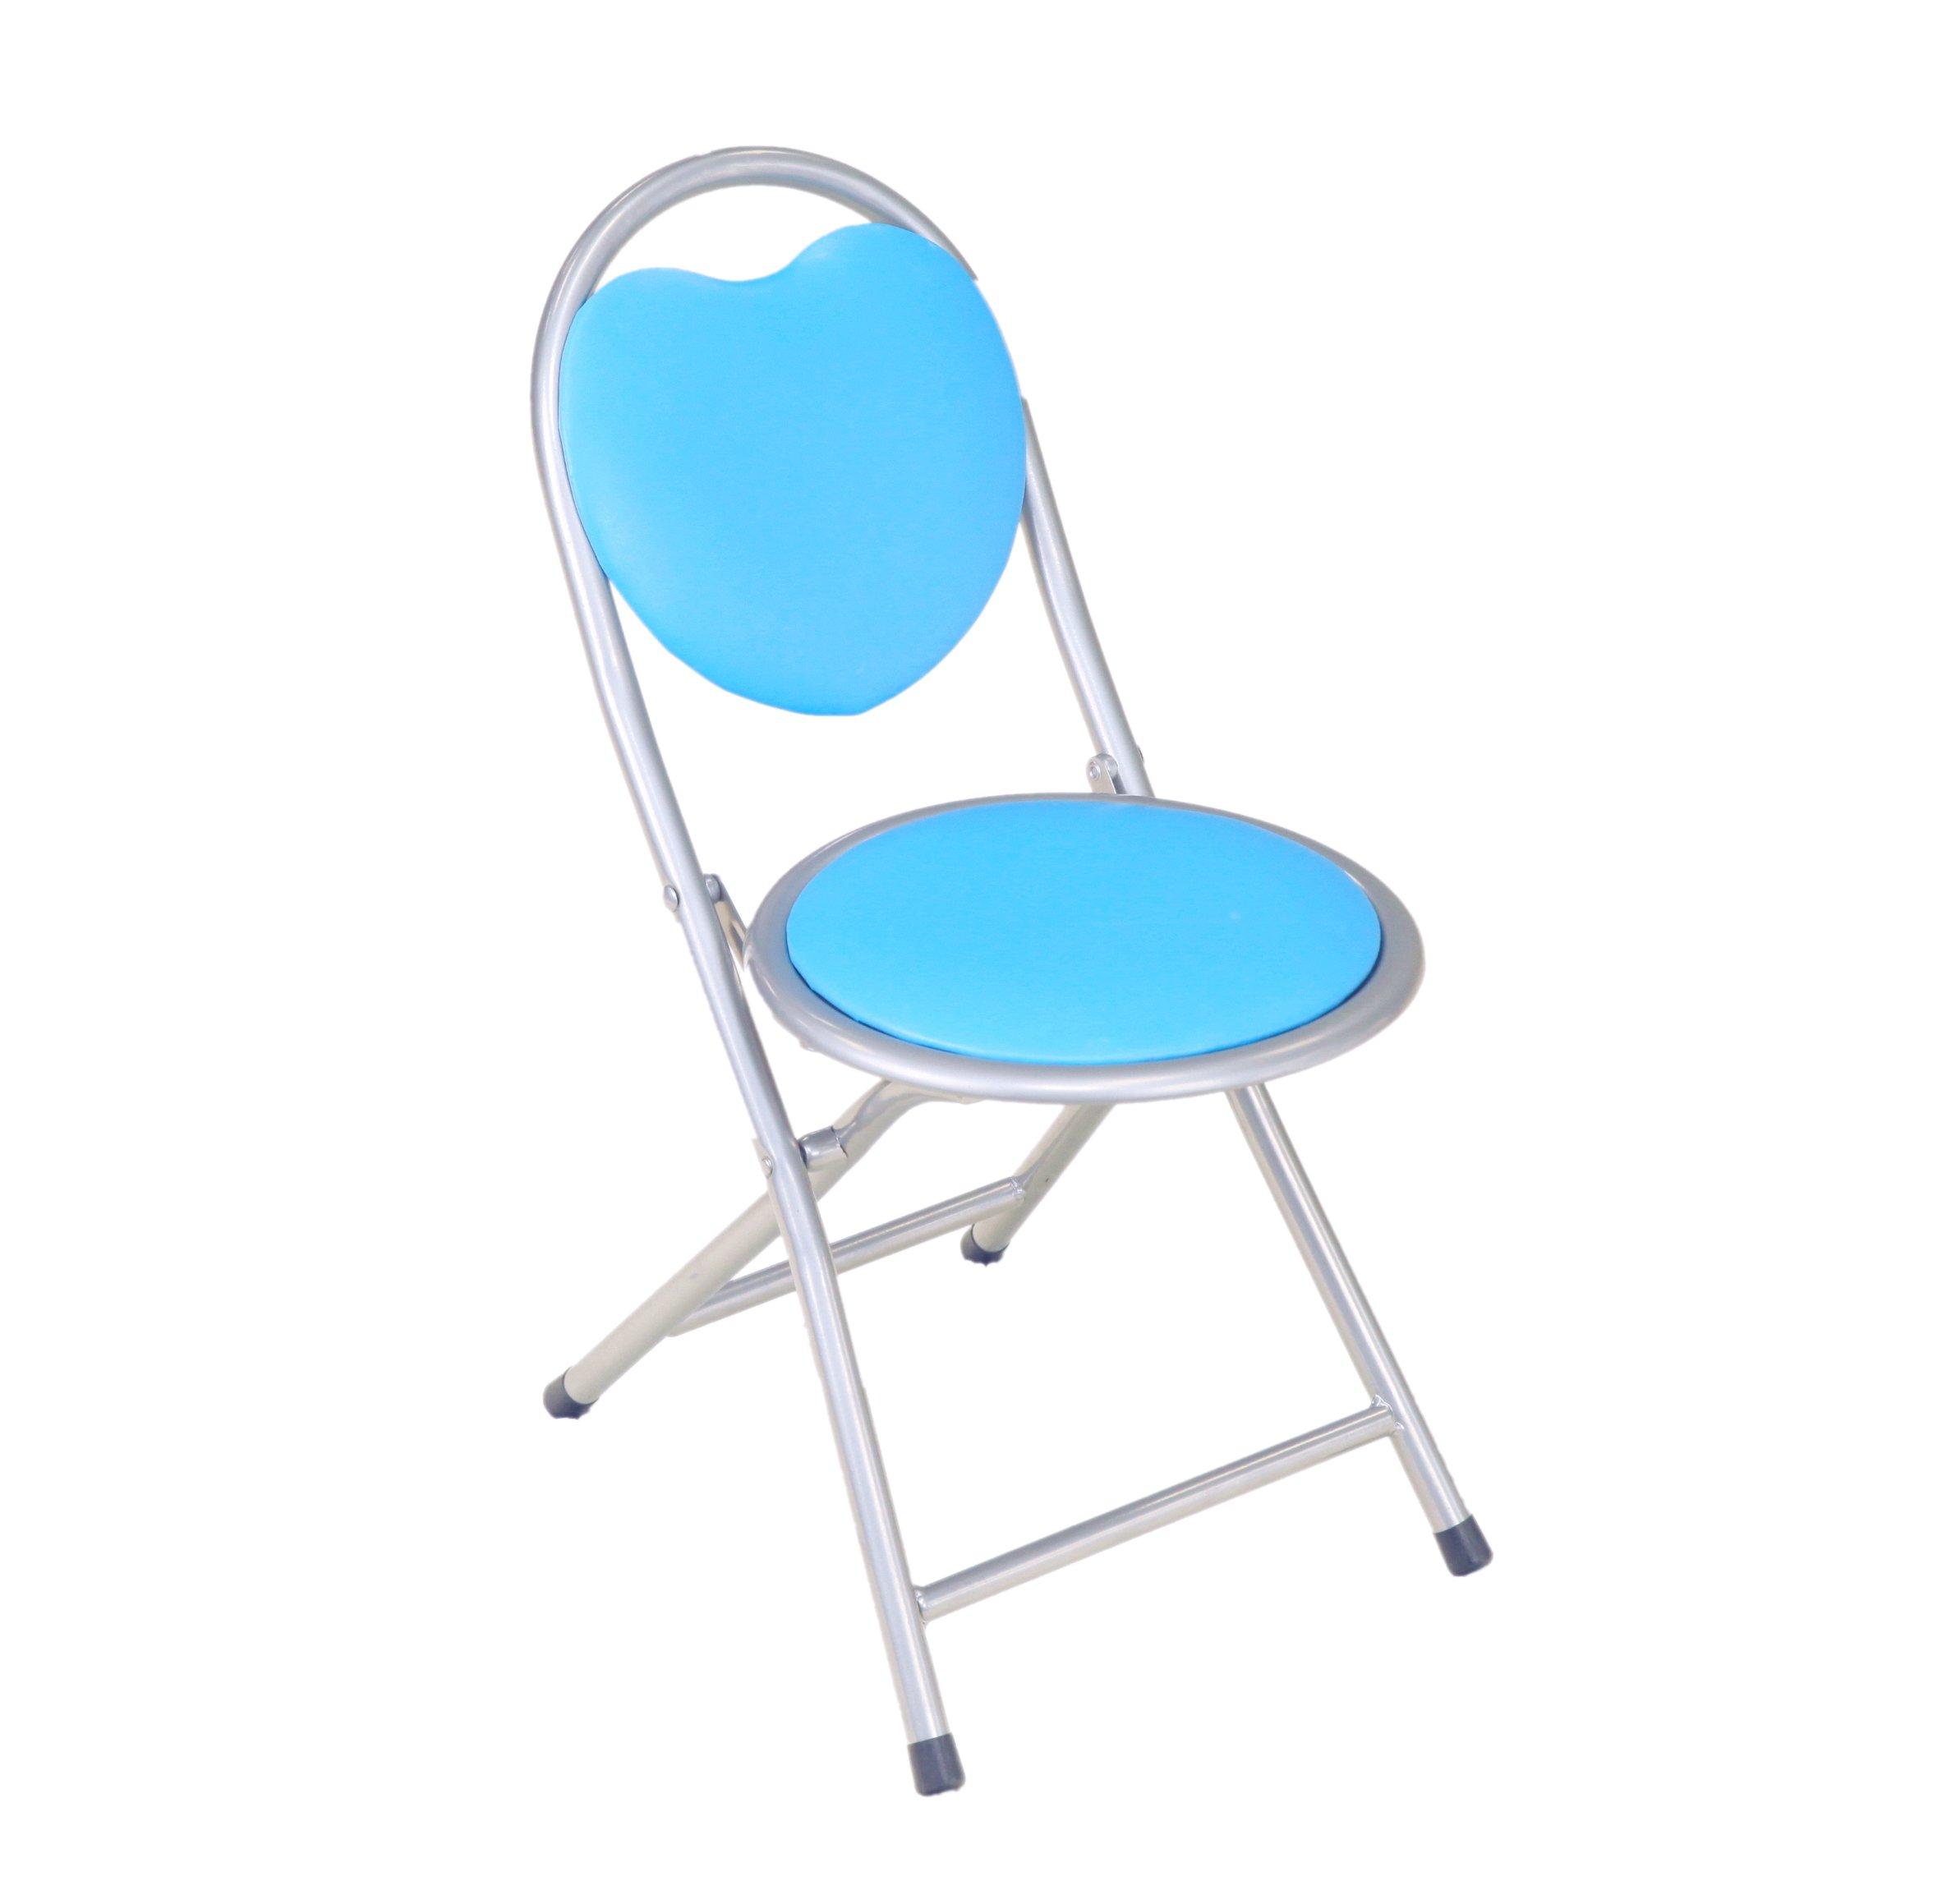 Frenchi Home Furnishing Kids Folding Chair, Blue